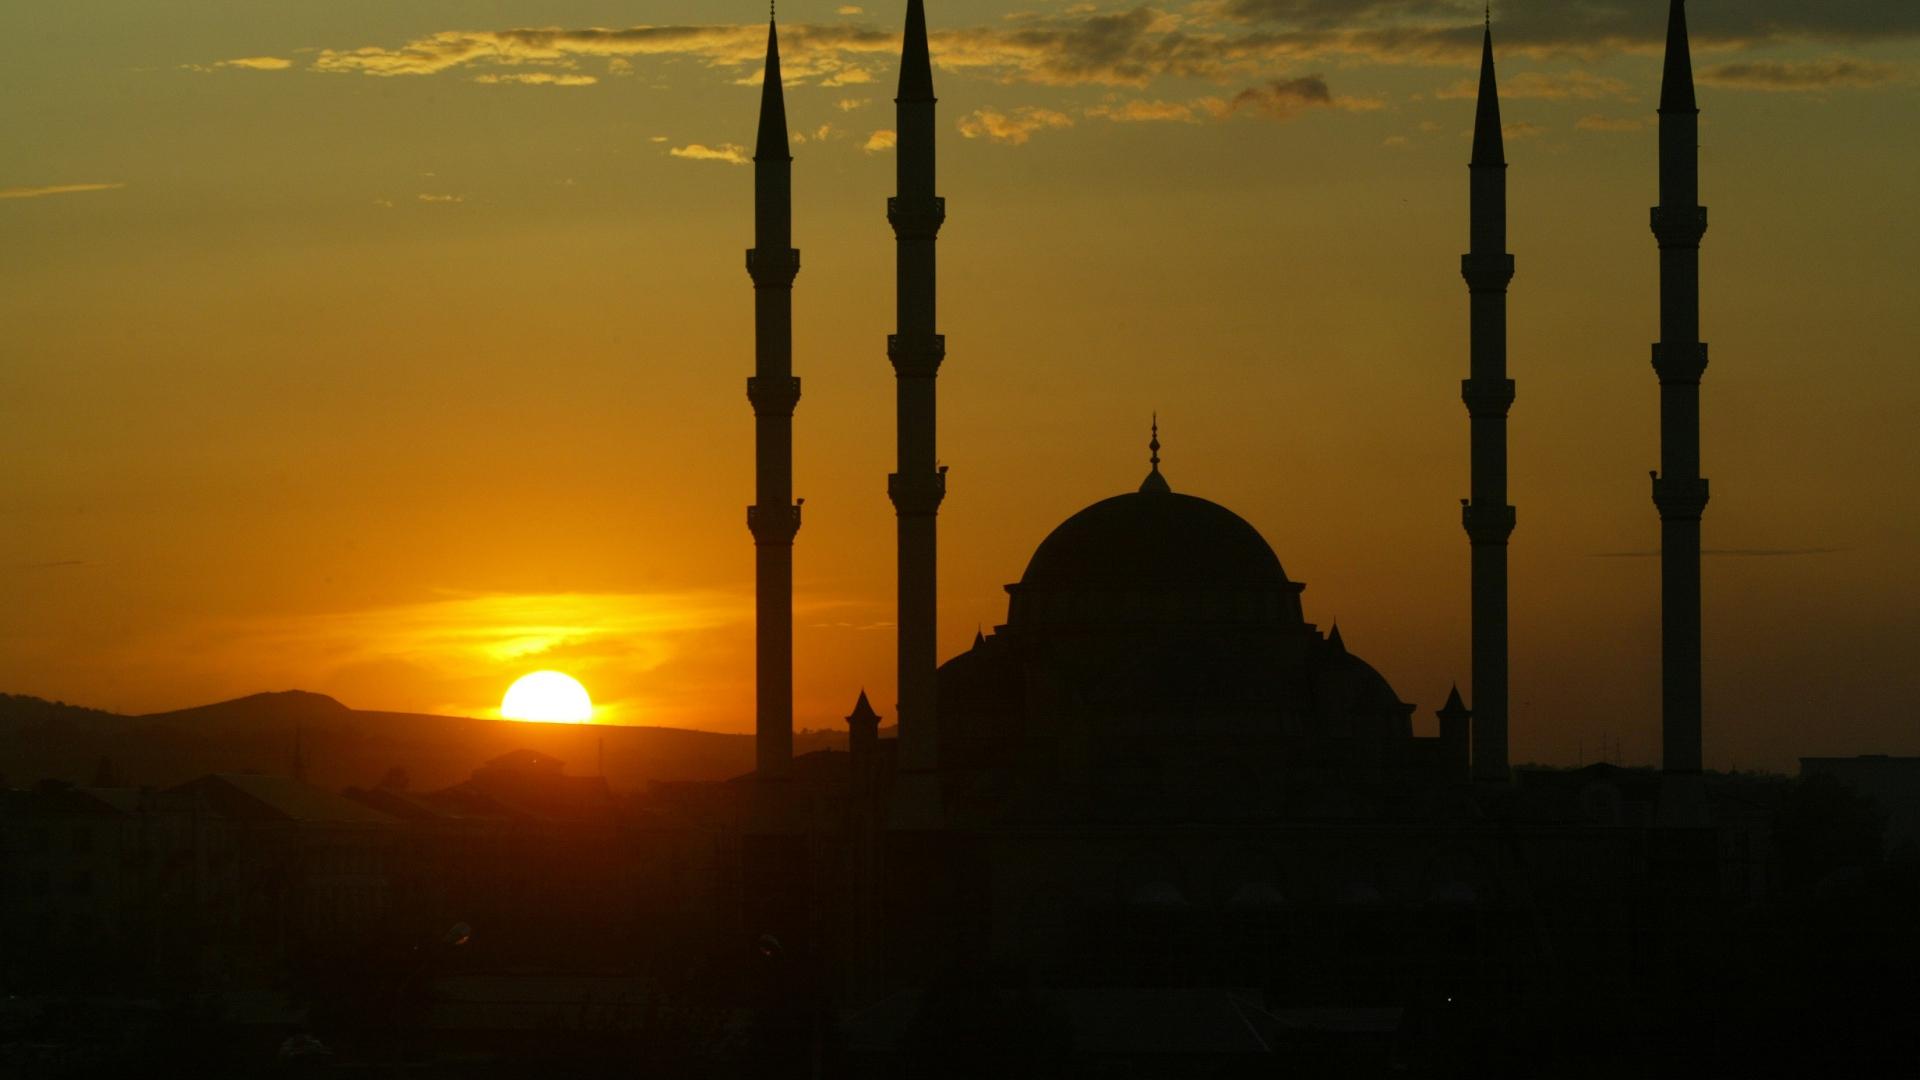 mosque hd wallpapers 1080p wallpapersafari